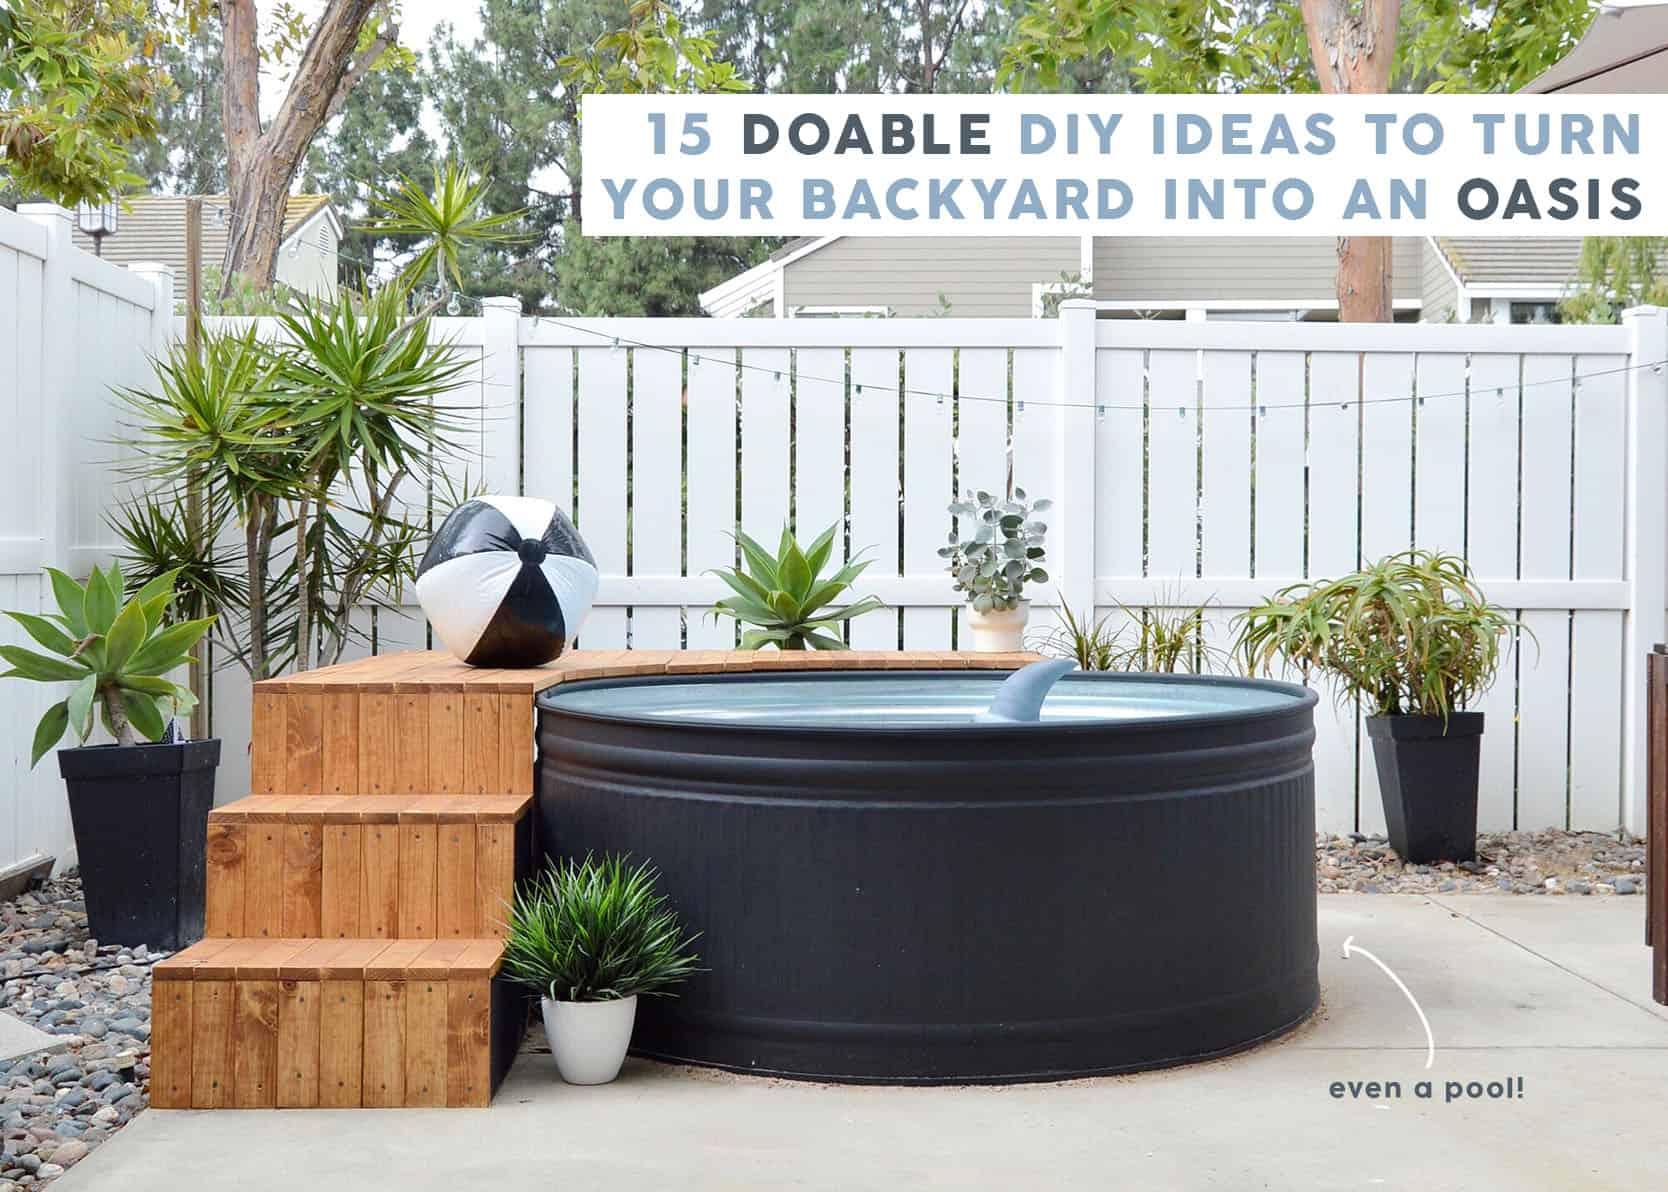 10 Doable Diy Ideas To Transform Your Backyard